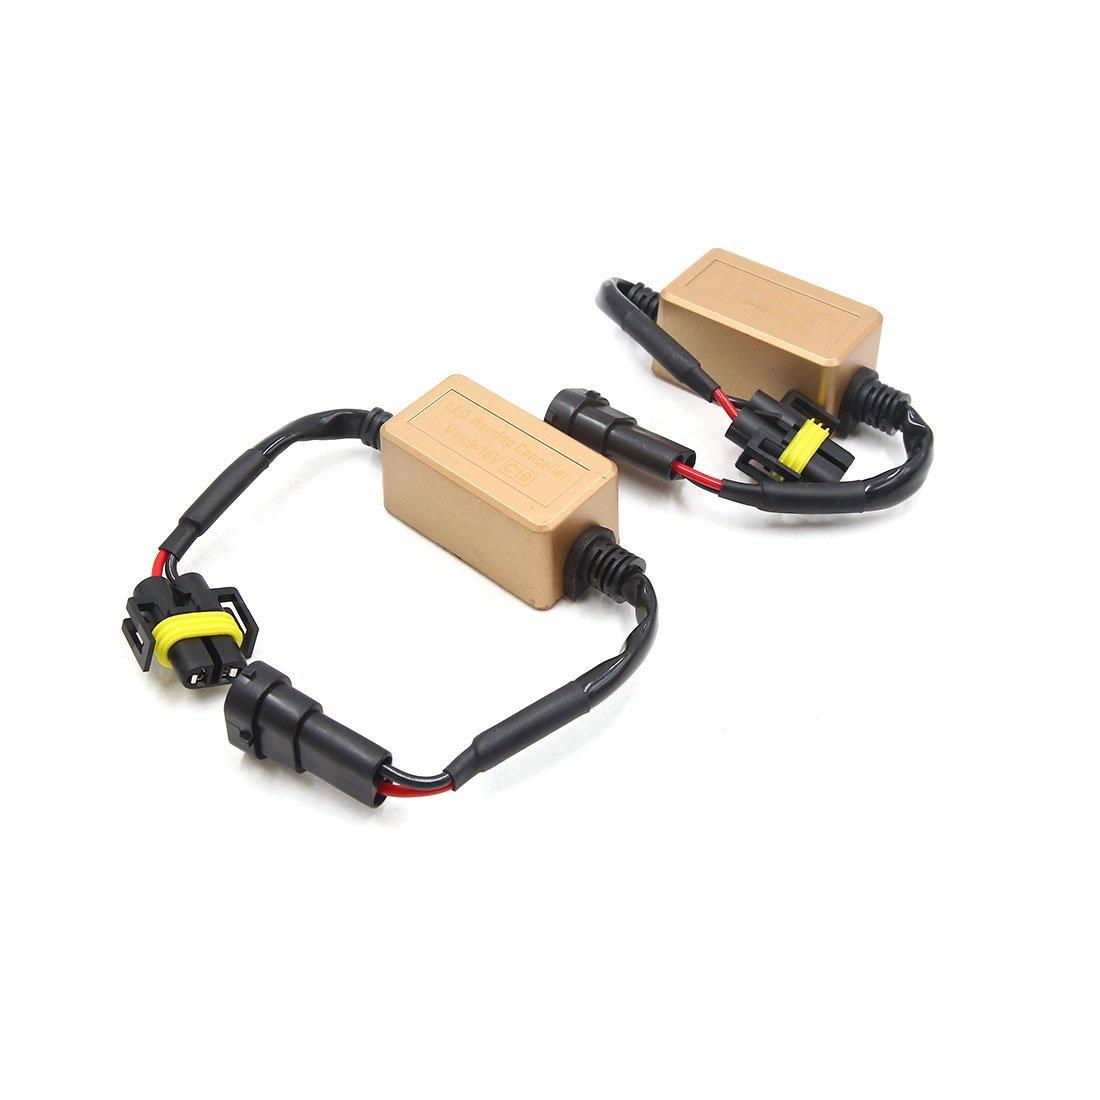 uxcell 2pcs 12V C16 H8 H9 H11 LED Canbus Error Anti-Flicker Resistor Decoder for Car